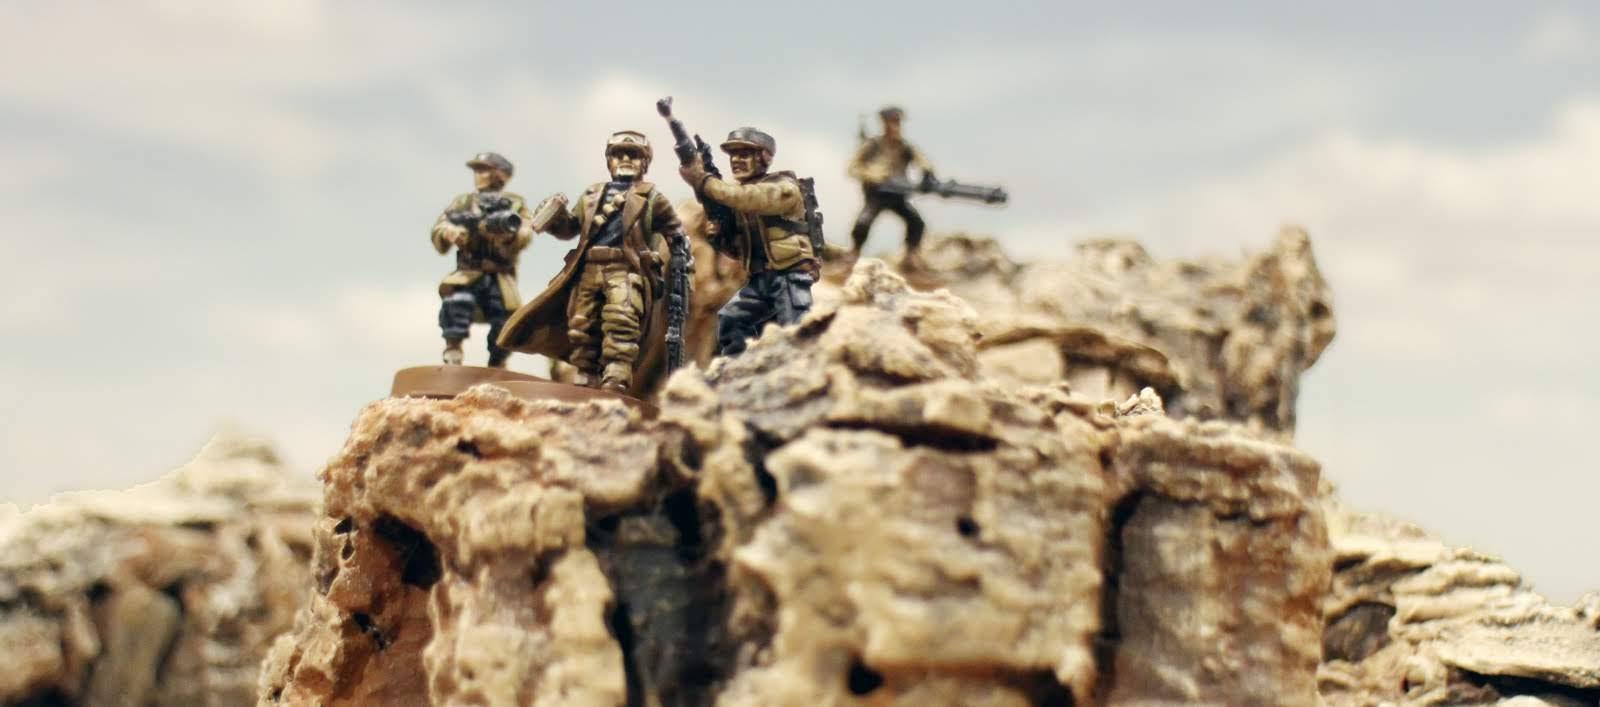 1000 Foot General: Rocky Desert Hills for Wargames Tutorial